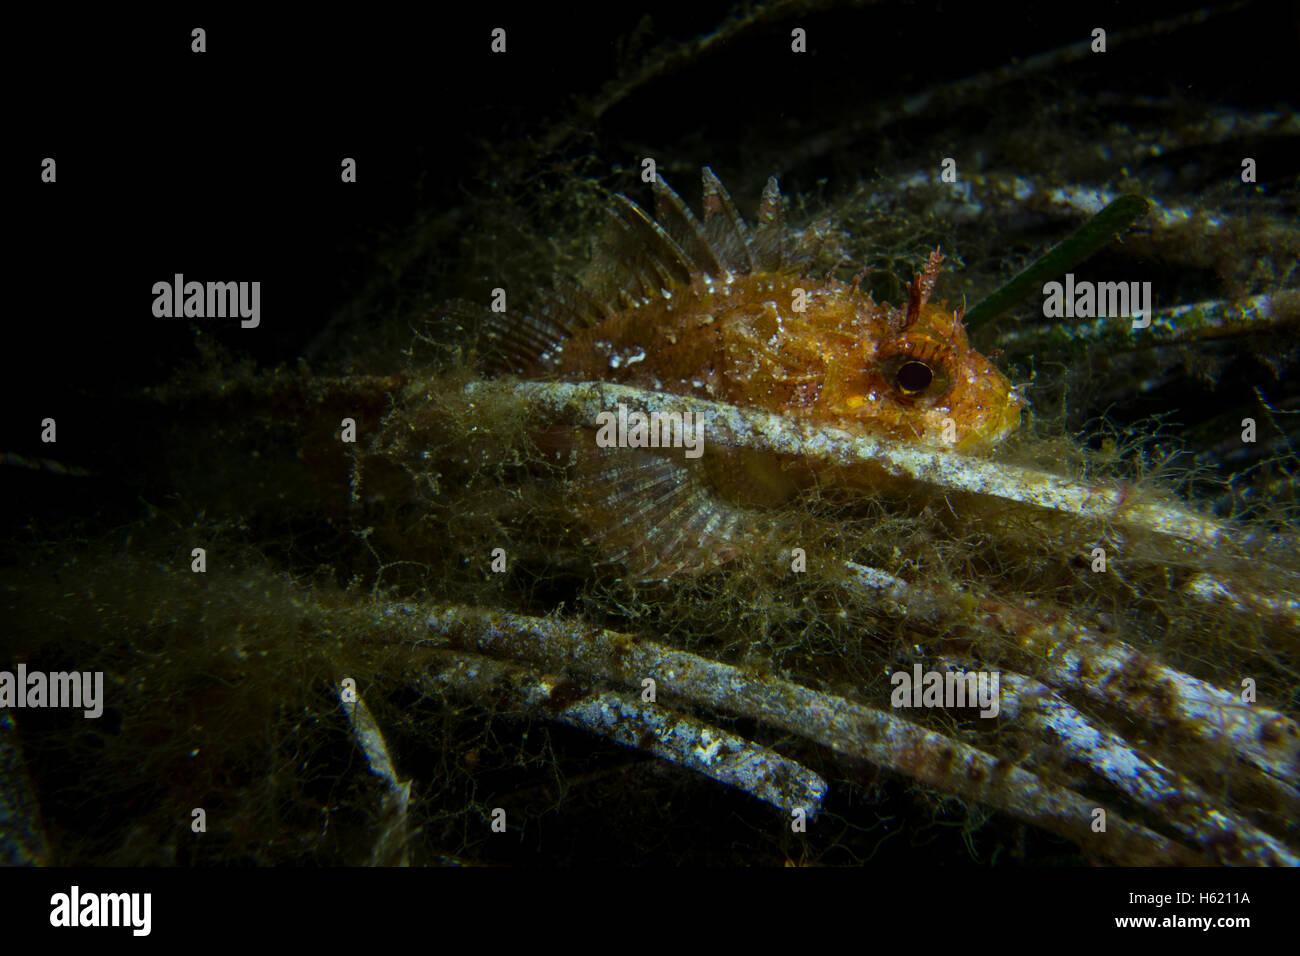 Dwarf Rockfish, Scorpaena notate, on Sea grass (Posidonia oceanica) algae covered fishing line in the Mediterranean - Stock Image